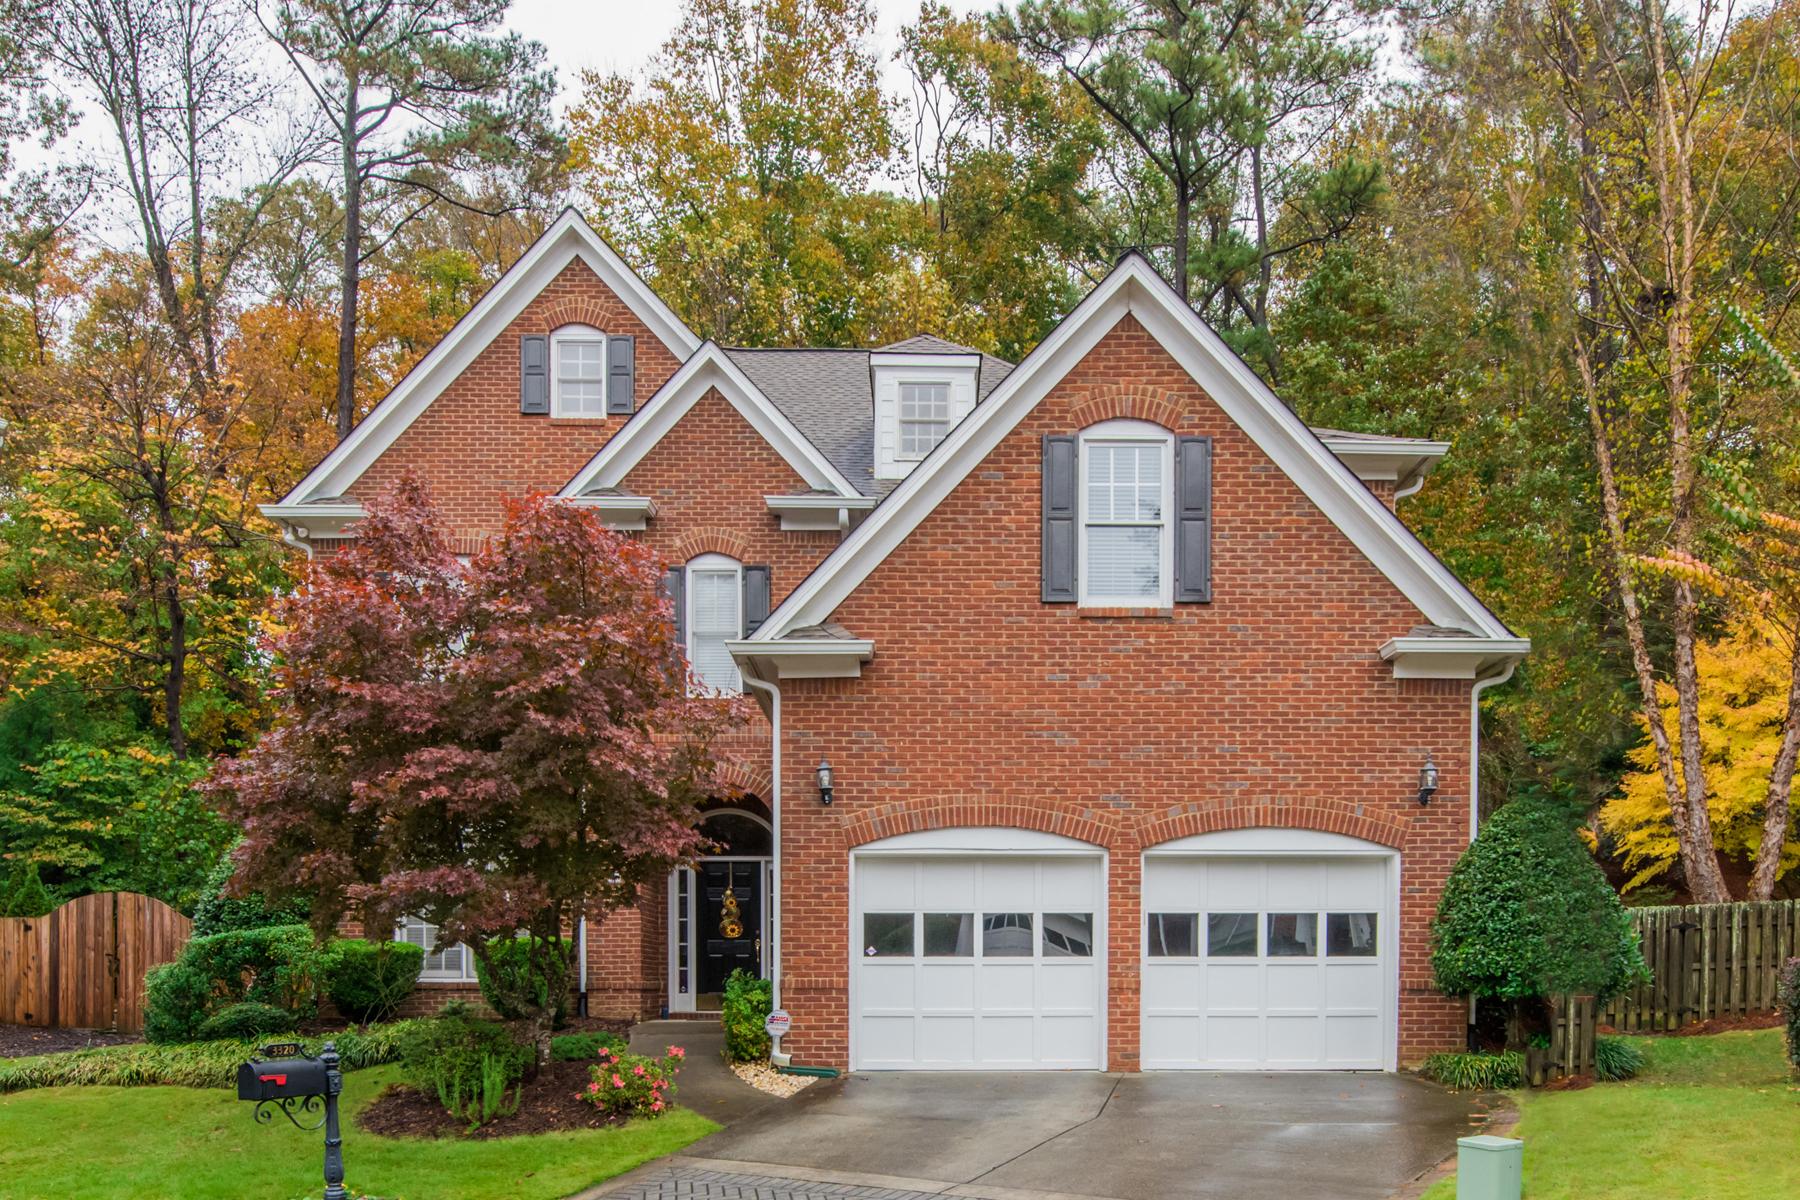 Single Family Home for Sale at Beautiful Windsor Park Traditional 3320 Windsor Lake Drive NE Brookhaven, Georgia 30319 United States